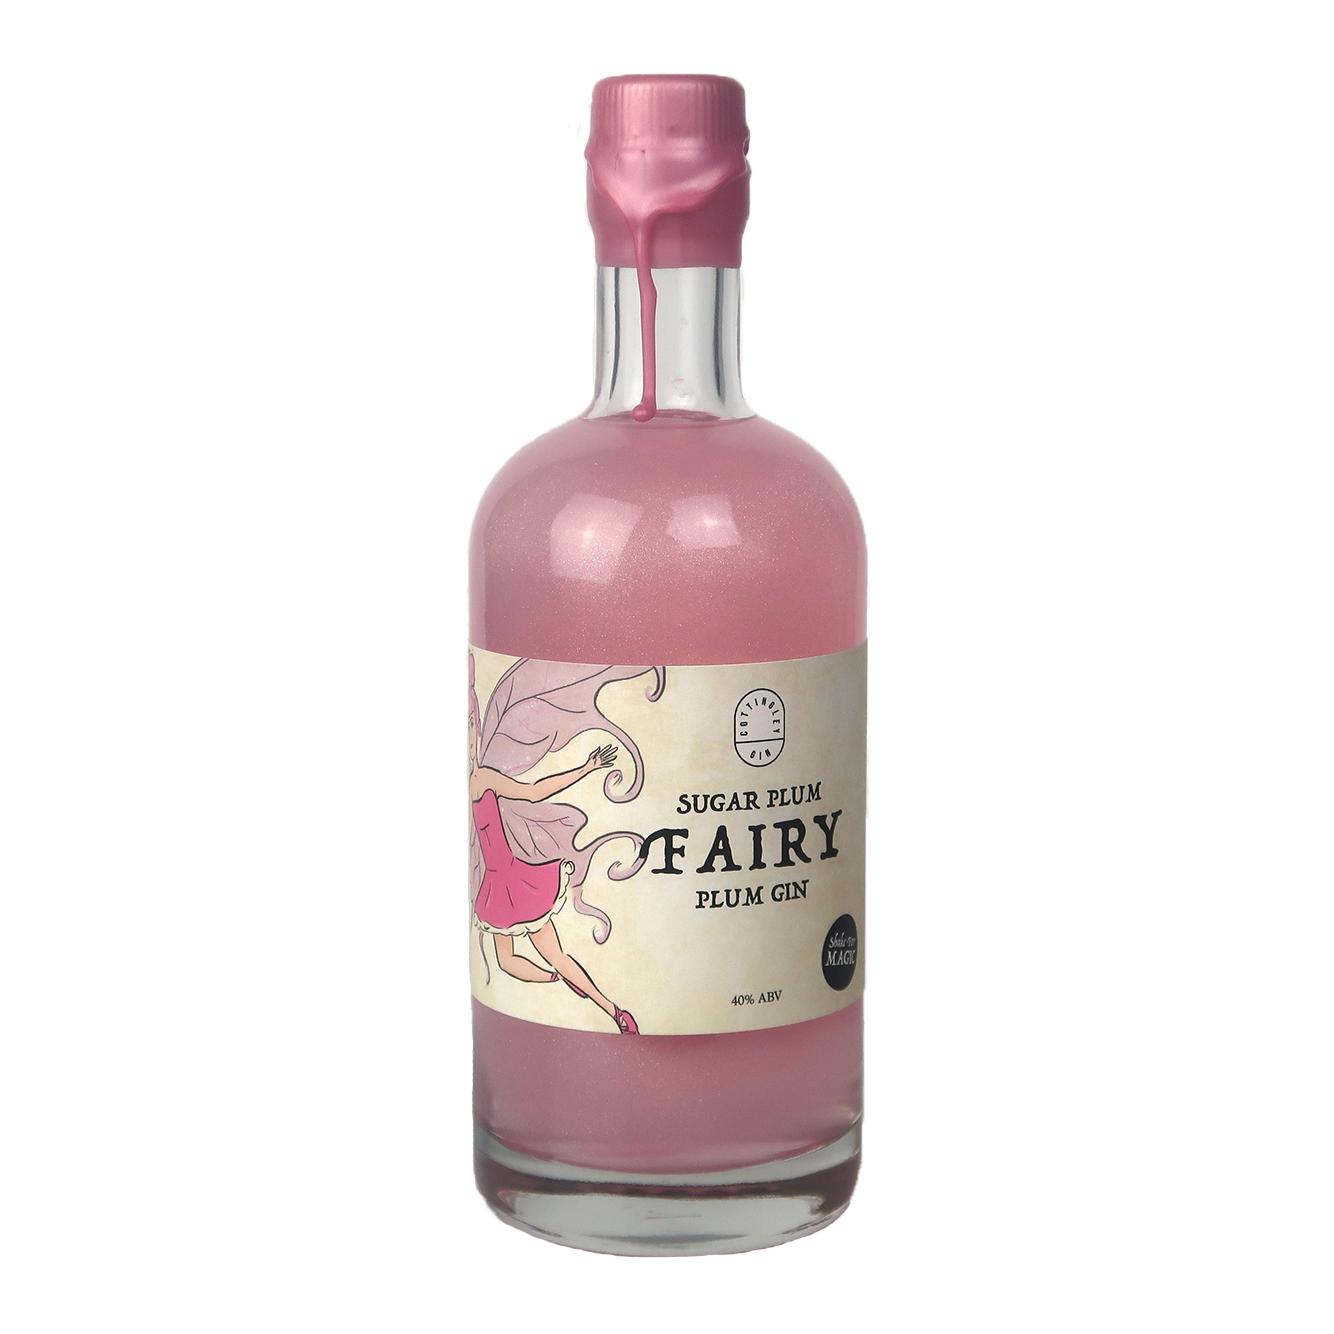 Cottingley Sugar Plum Fairy Plum Gin